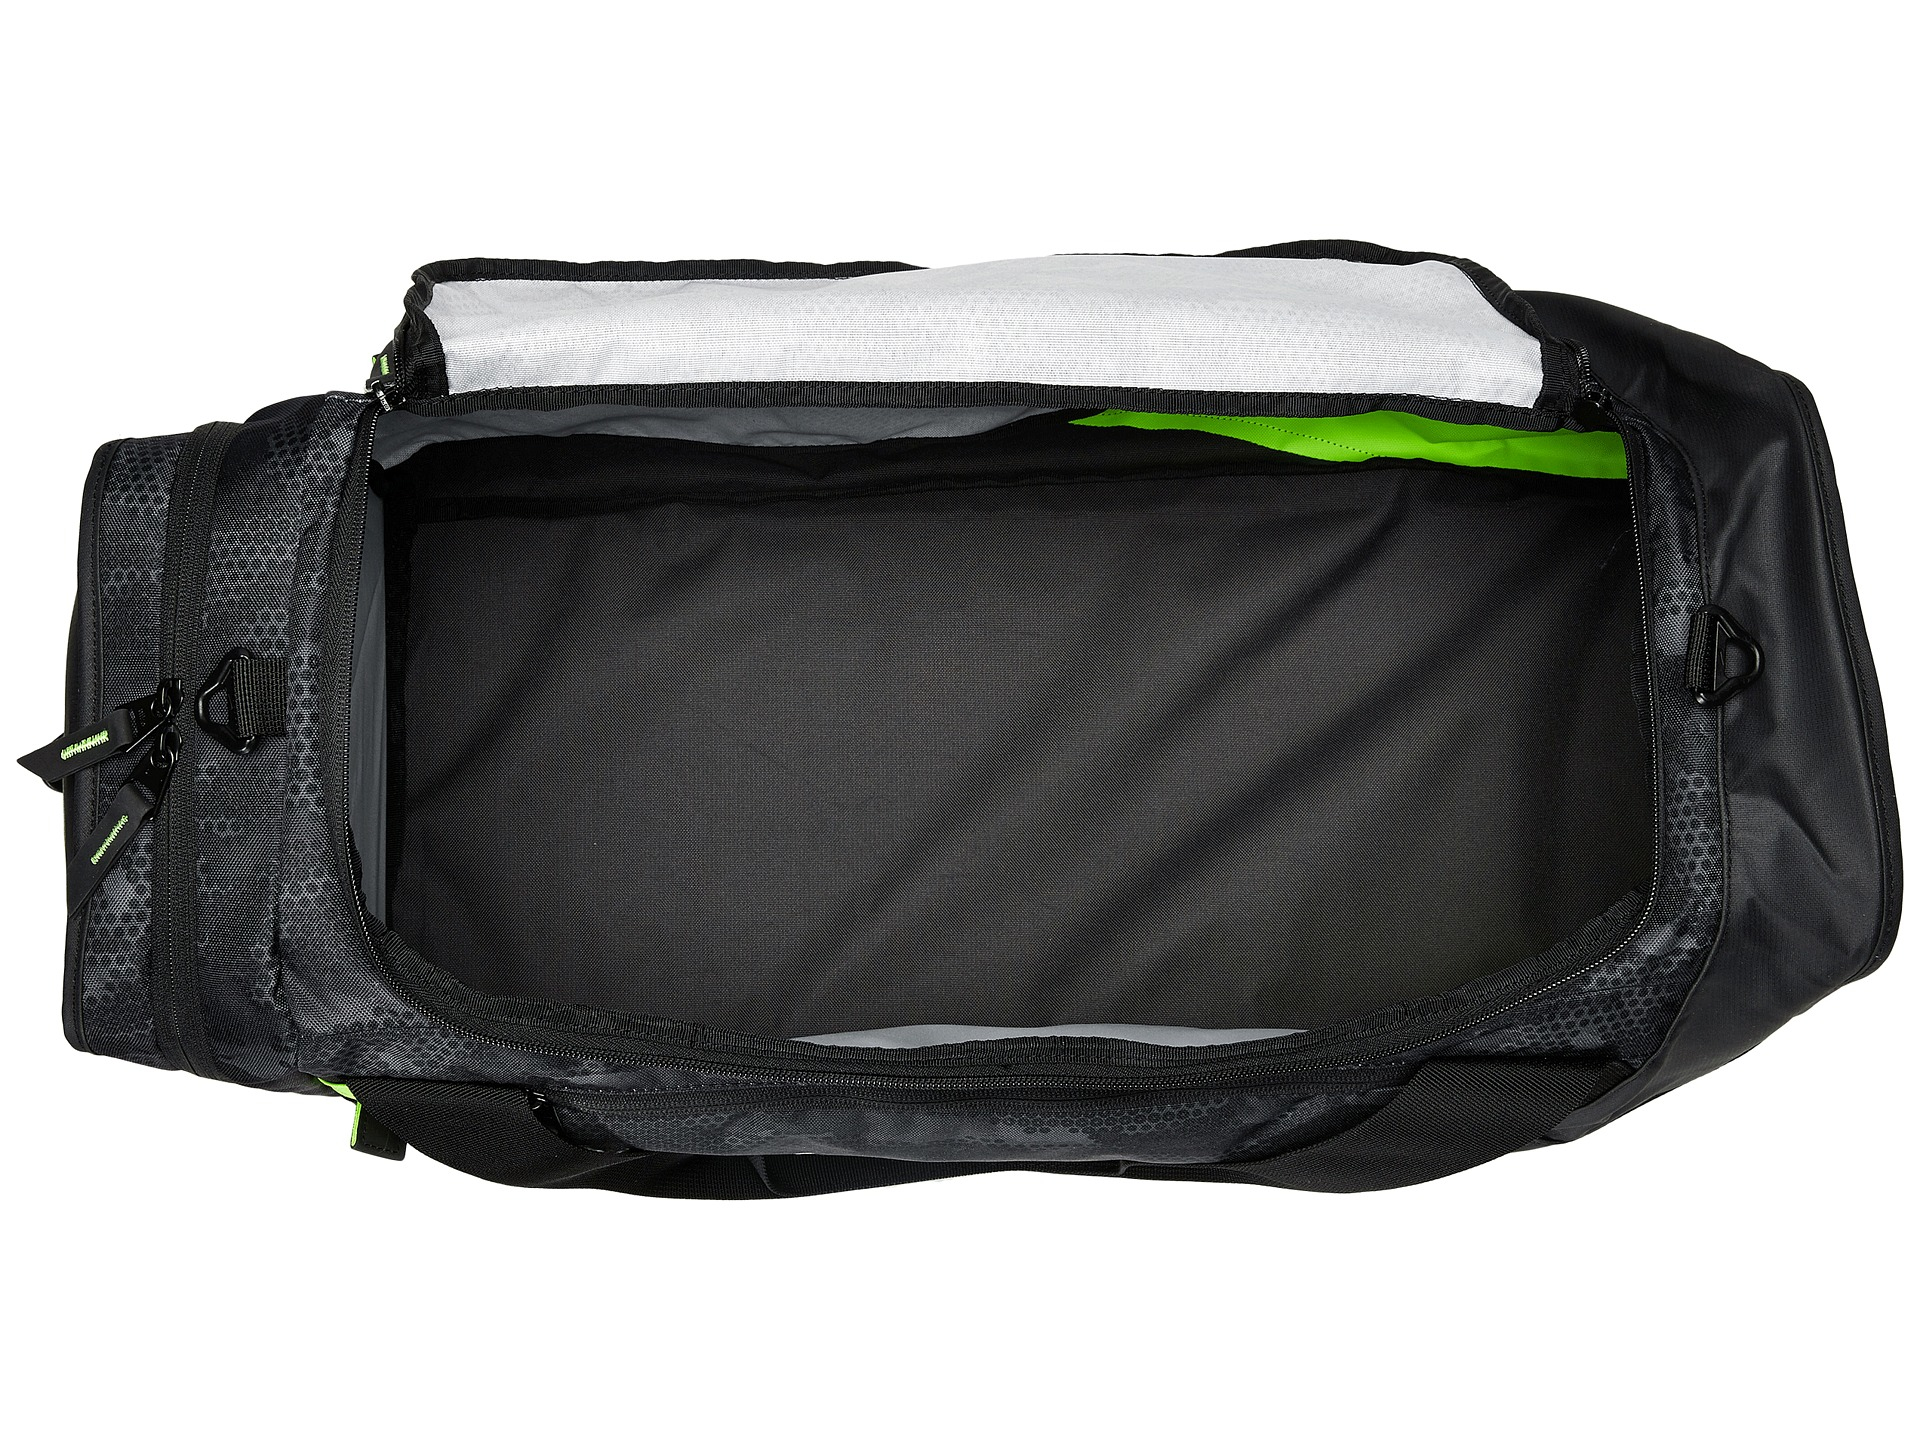 25d3b3a63c4e Nike Keystone Baseball Duffel Bag